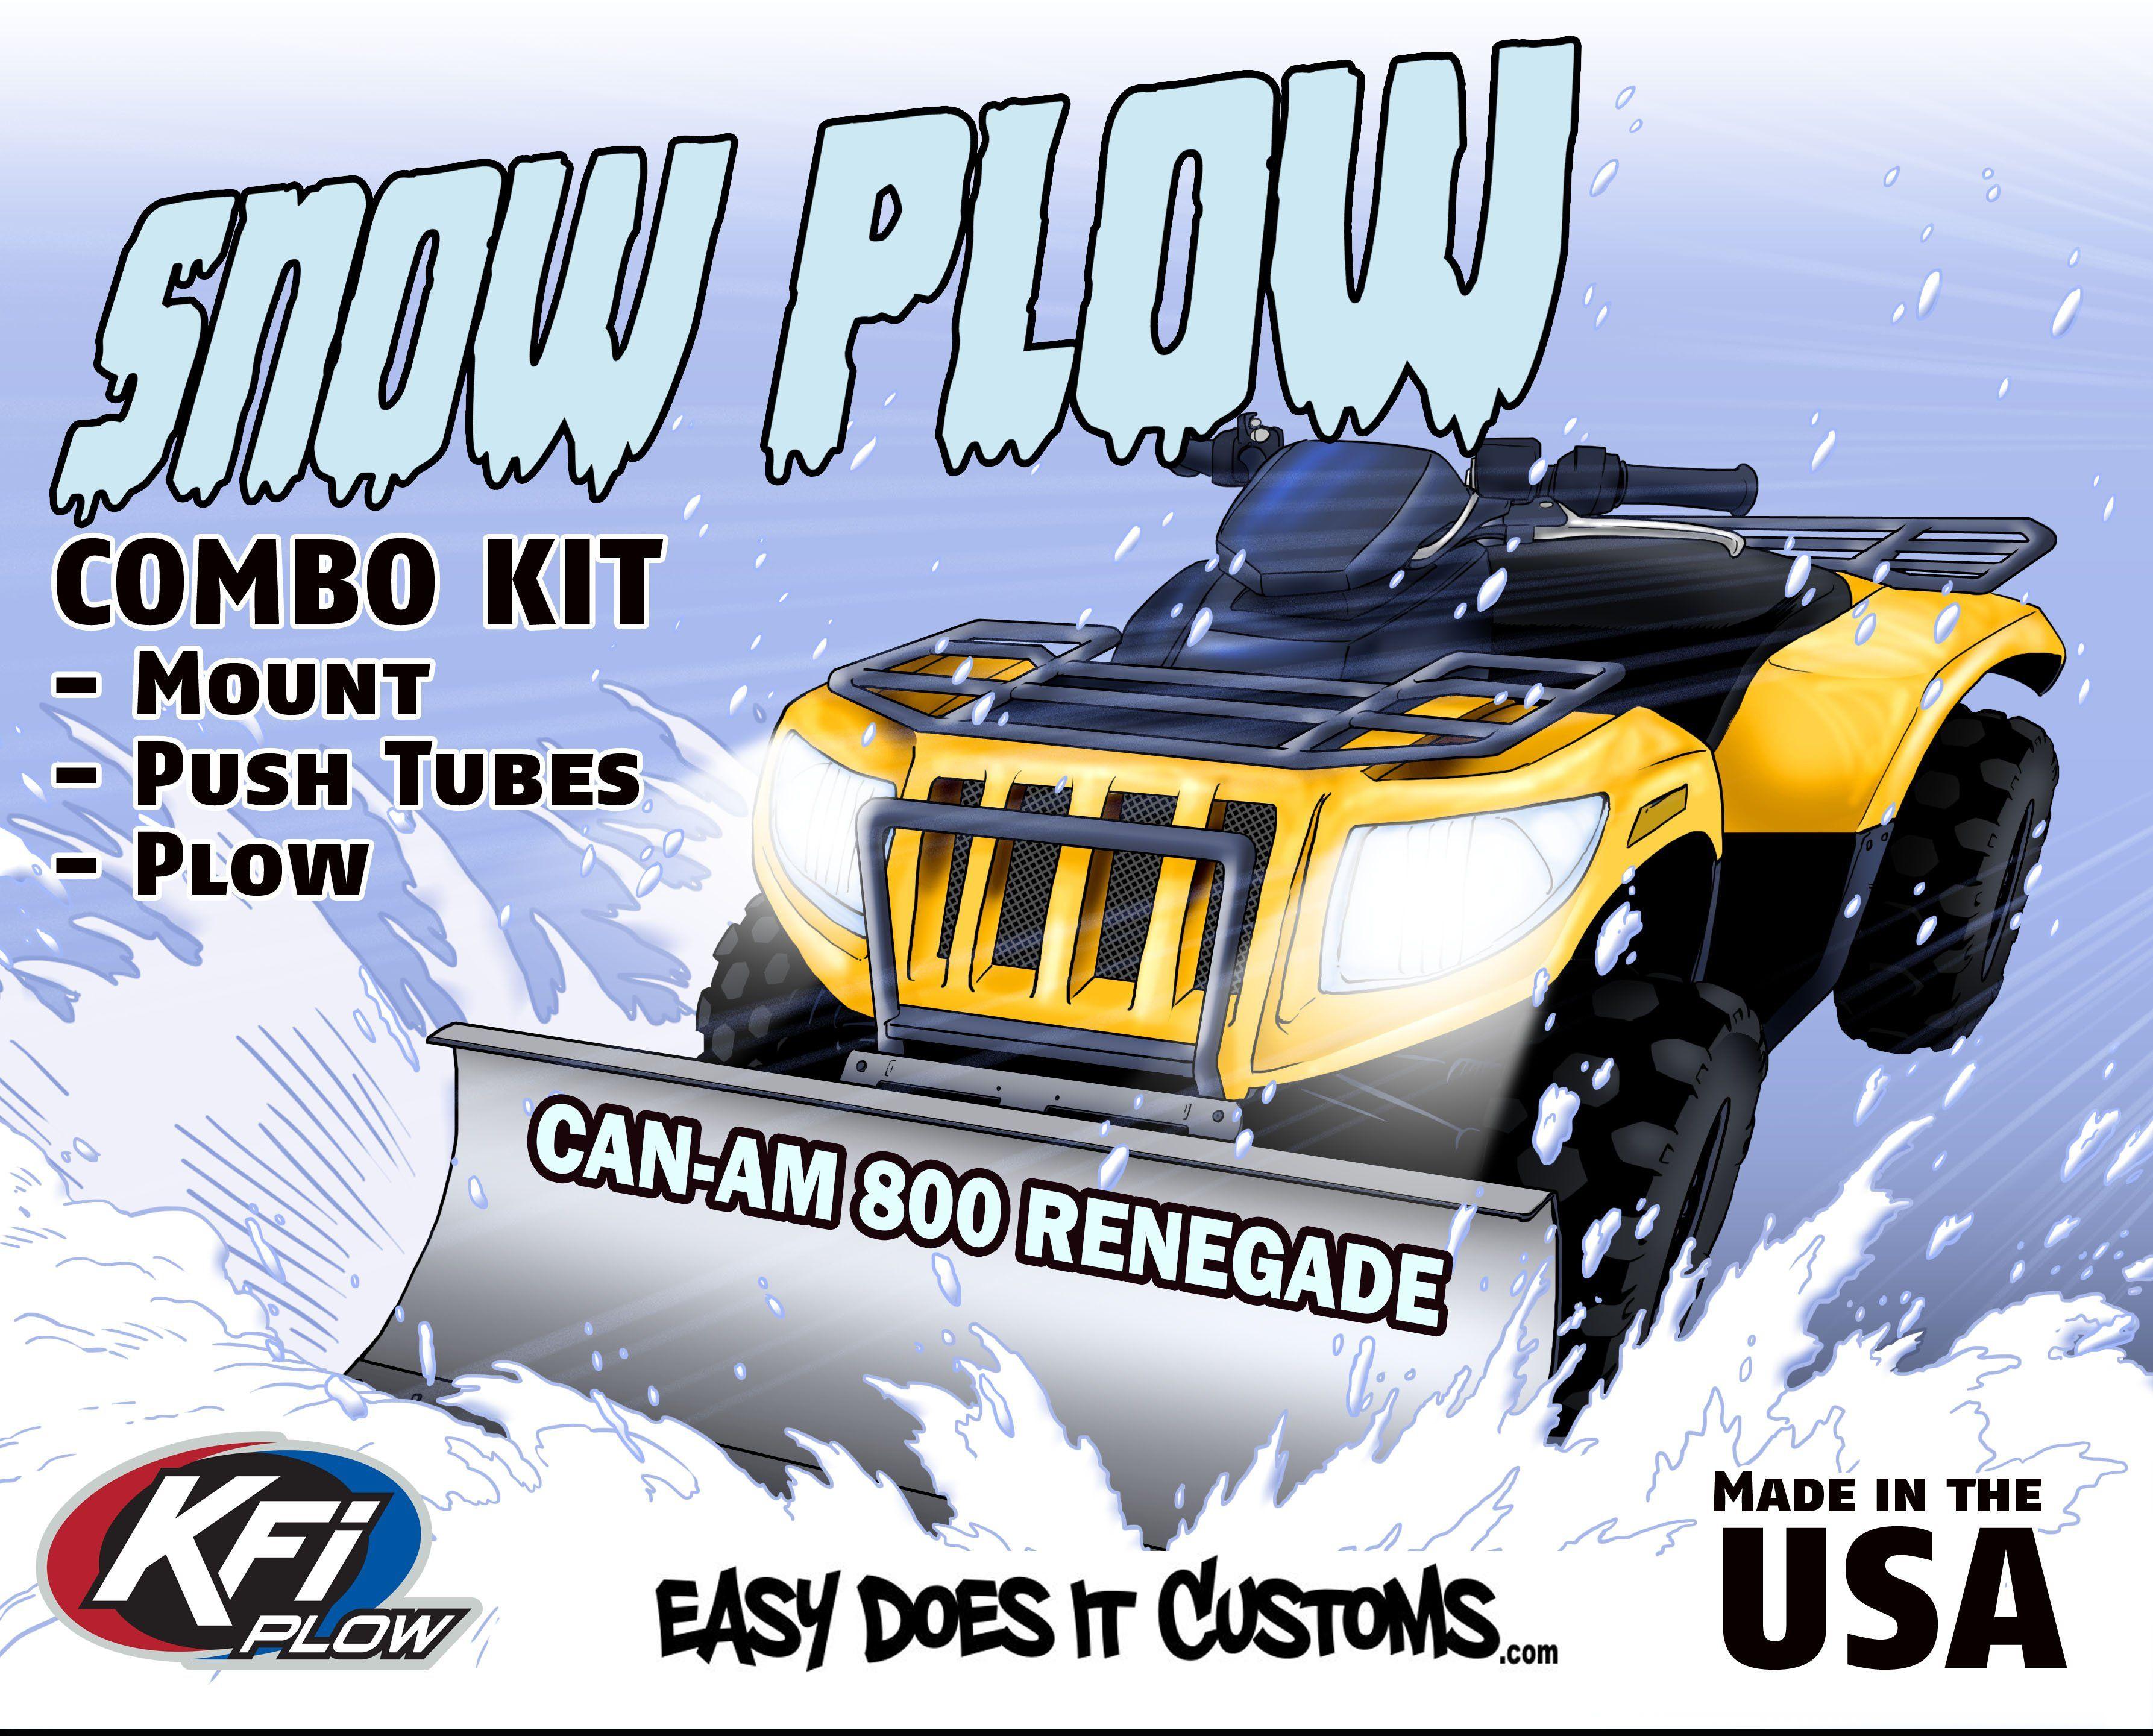 Renegade Plow Mount KFI 105445 Can-Am G2 Outlander